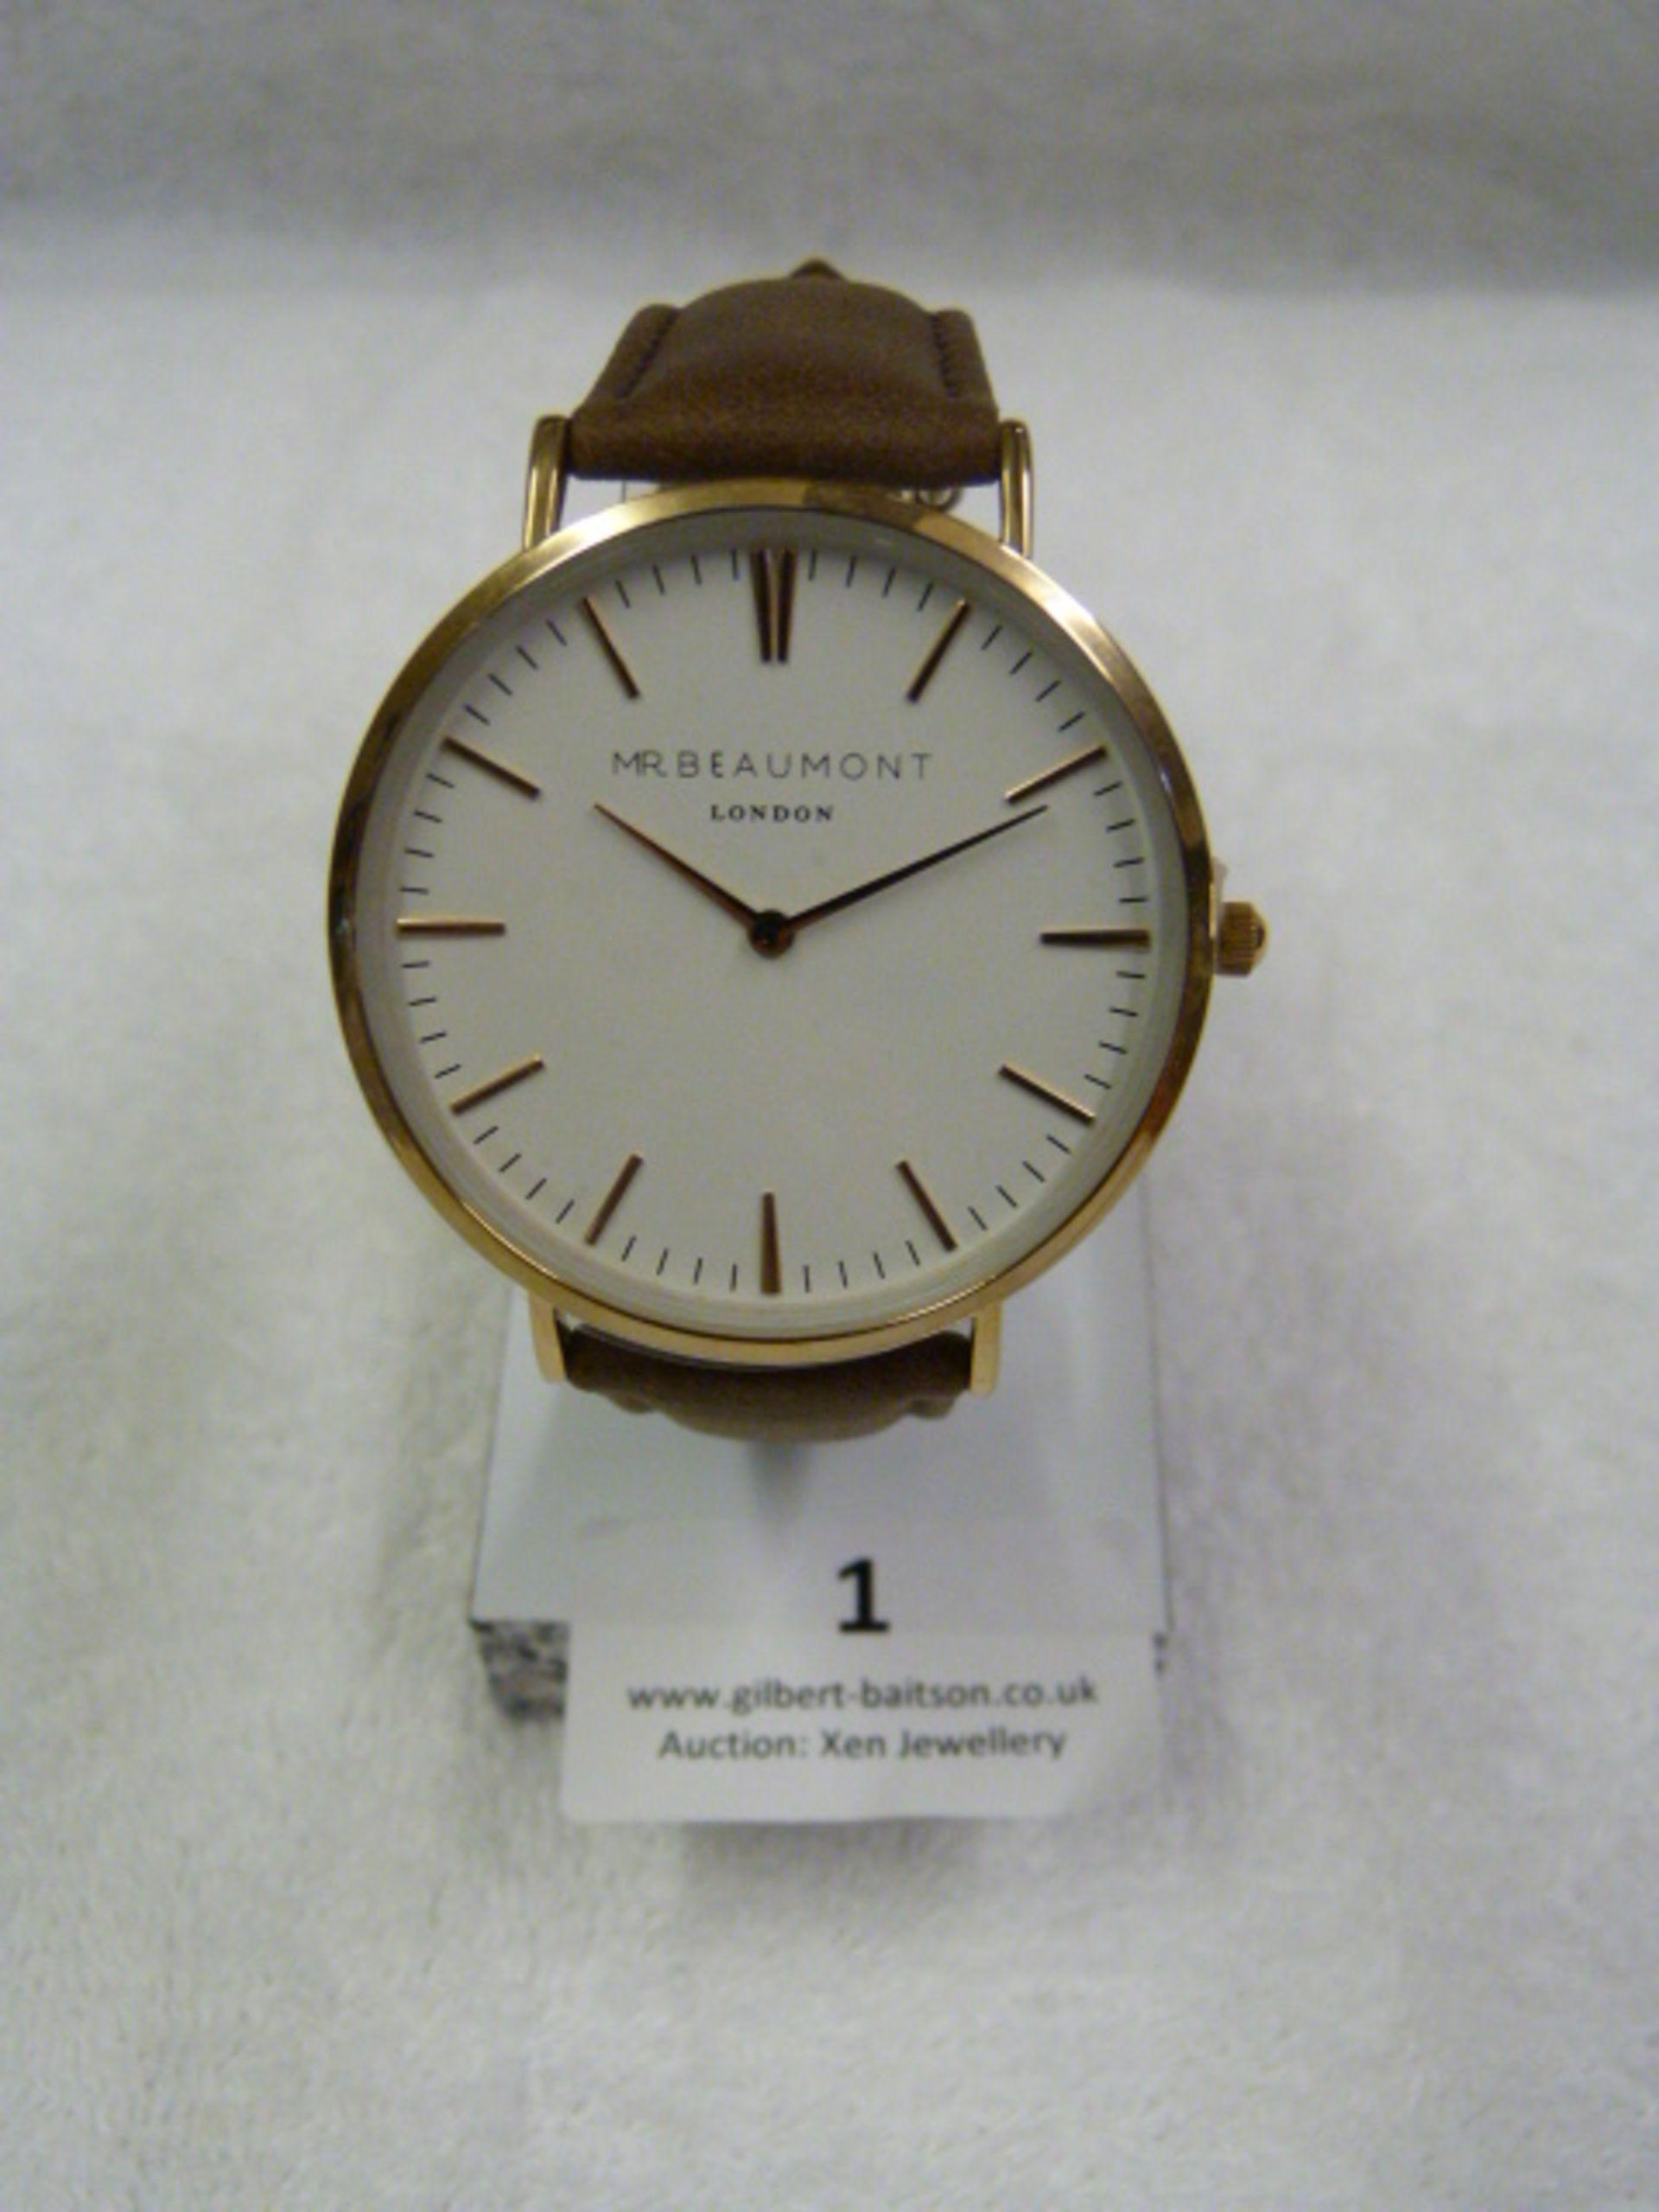 Lot 1 - *Mr Beaumont of London Gents Wristwatch